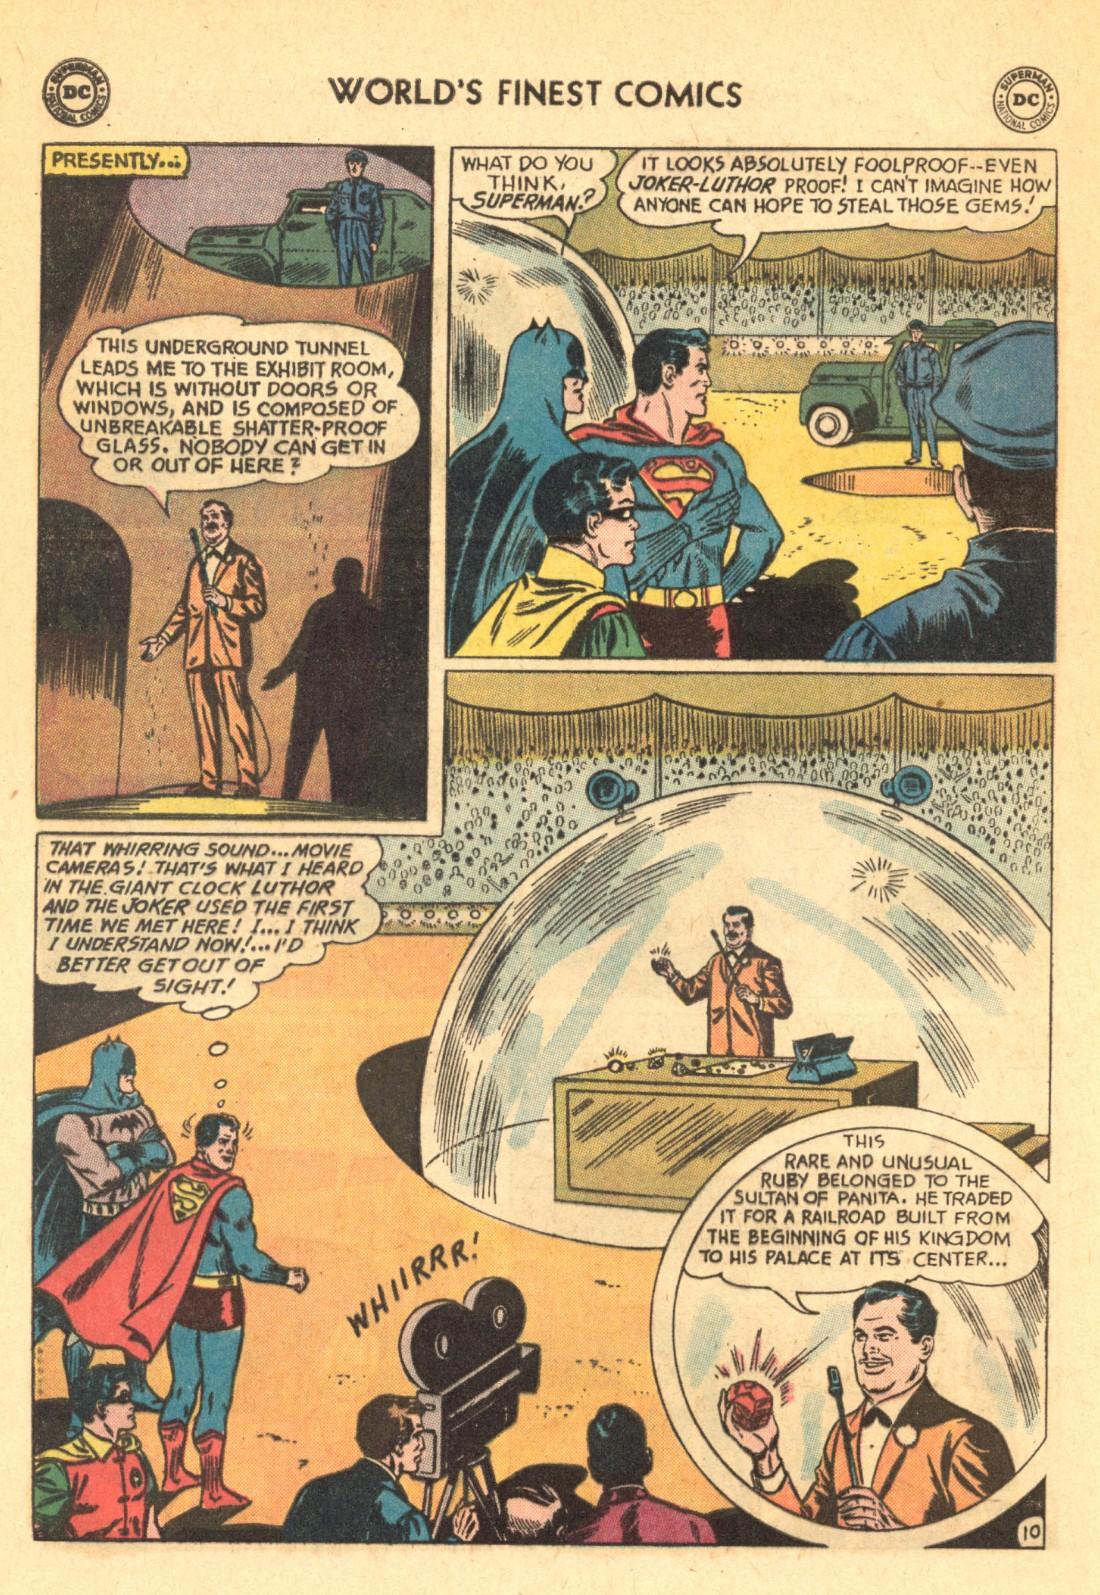 Read online World's Finest Comics comic -  Issue #129 - 12